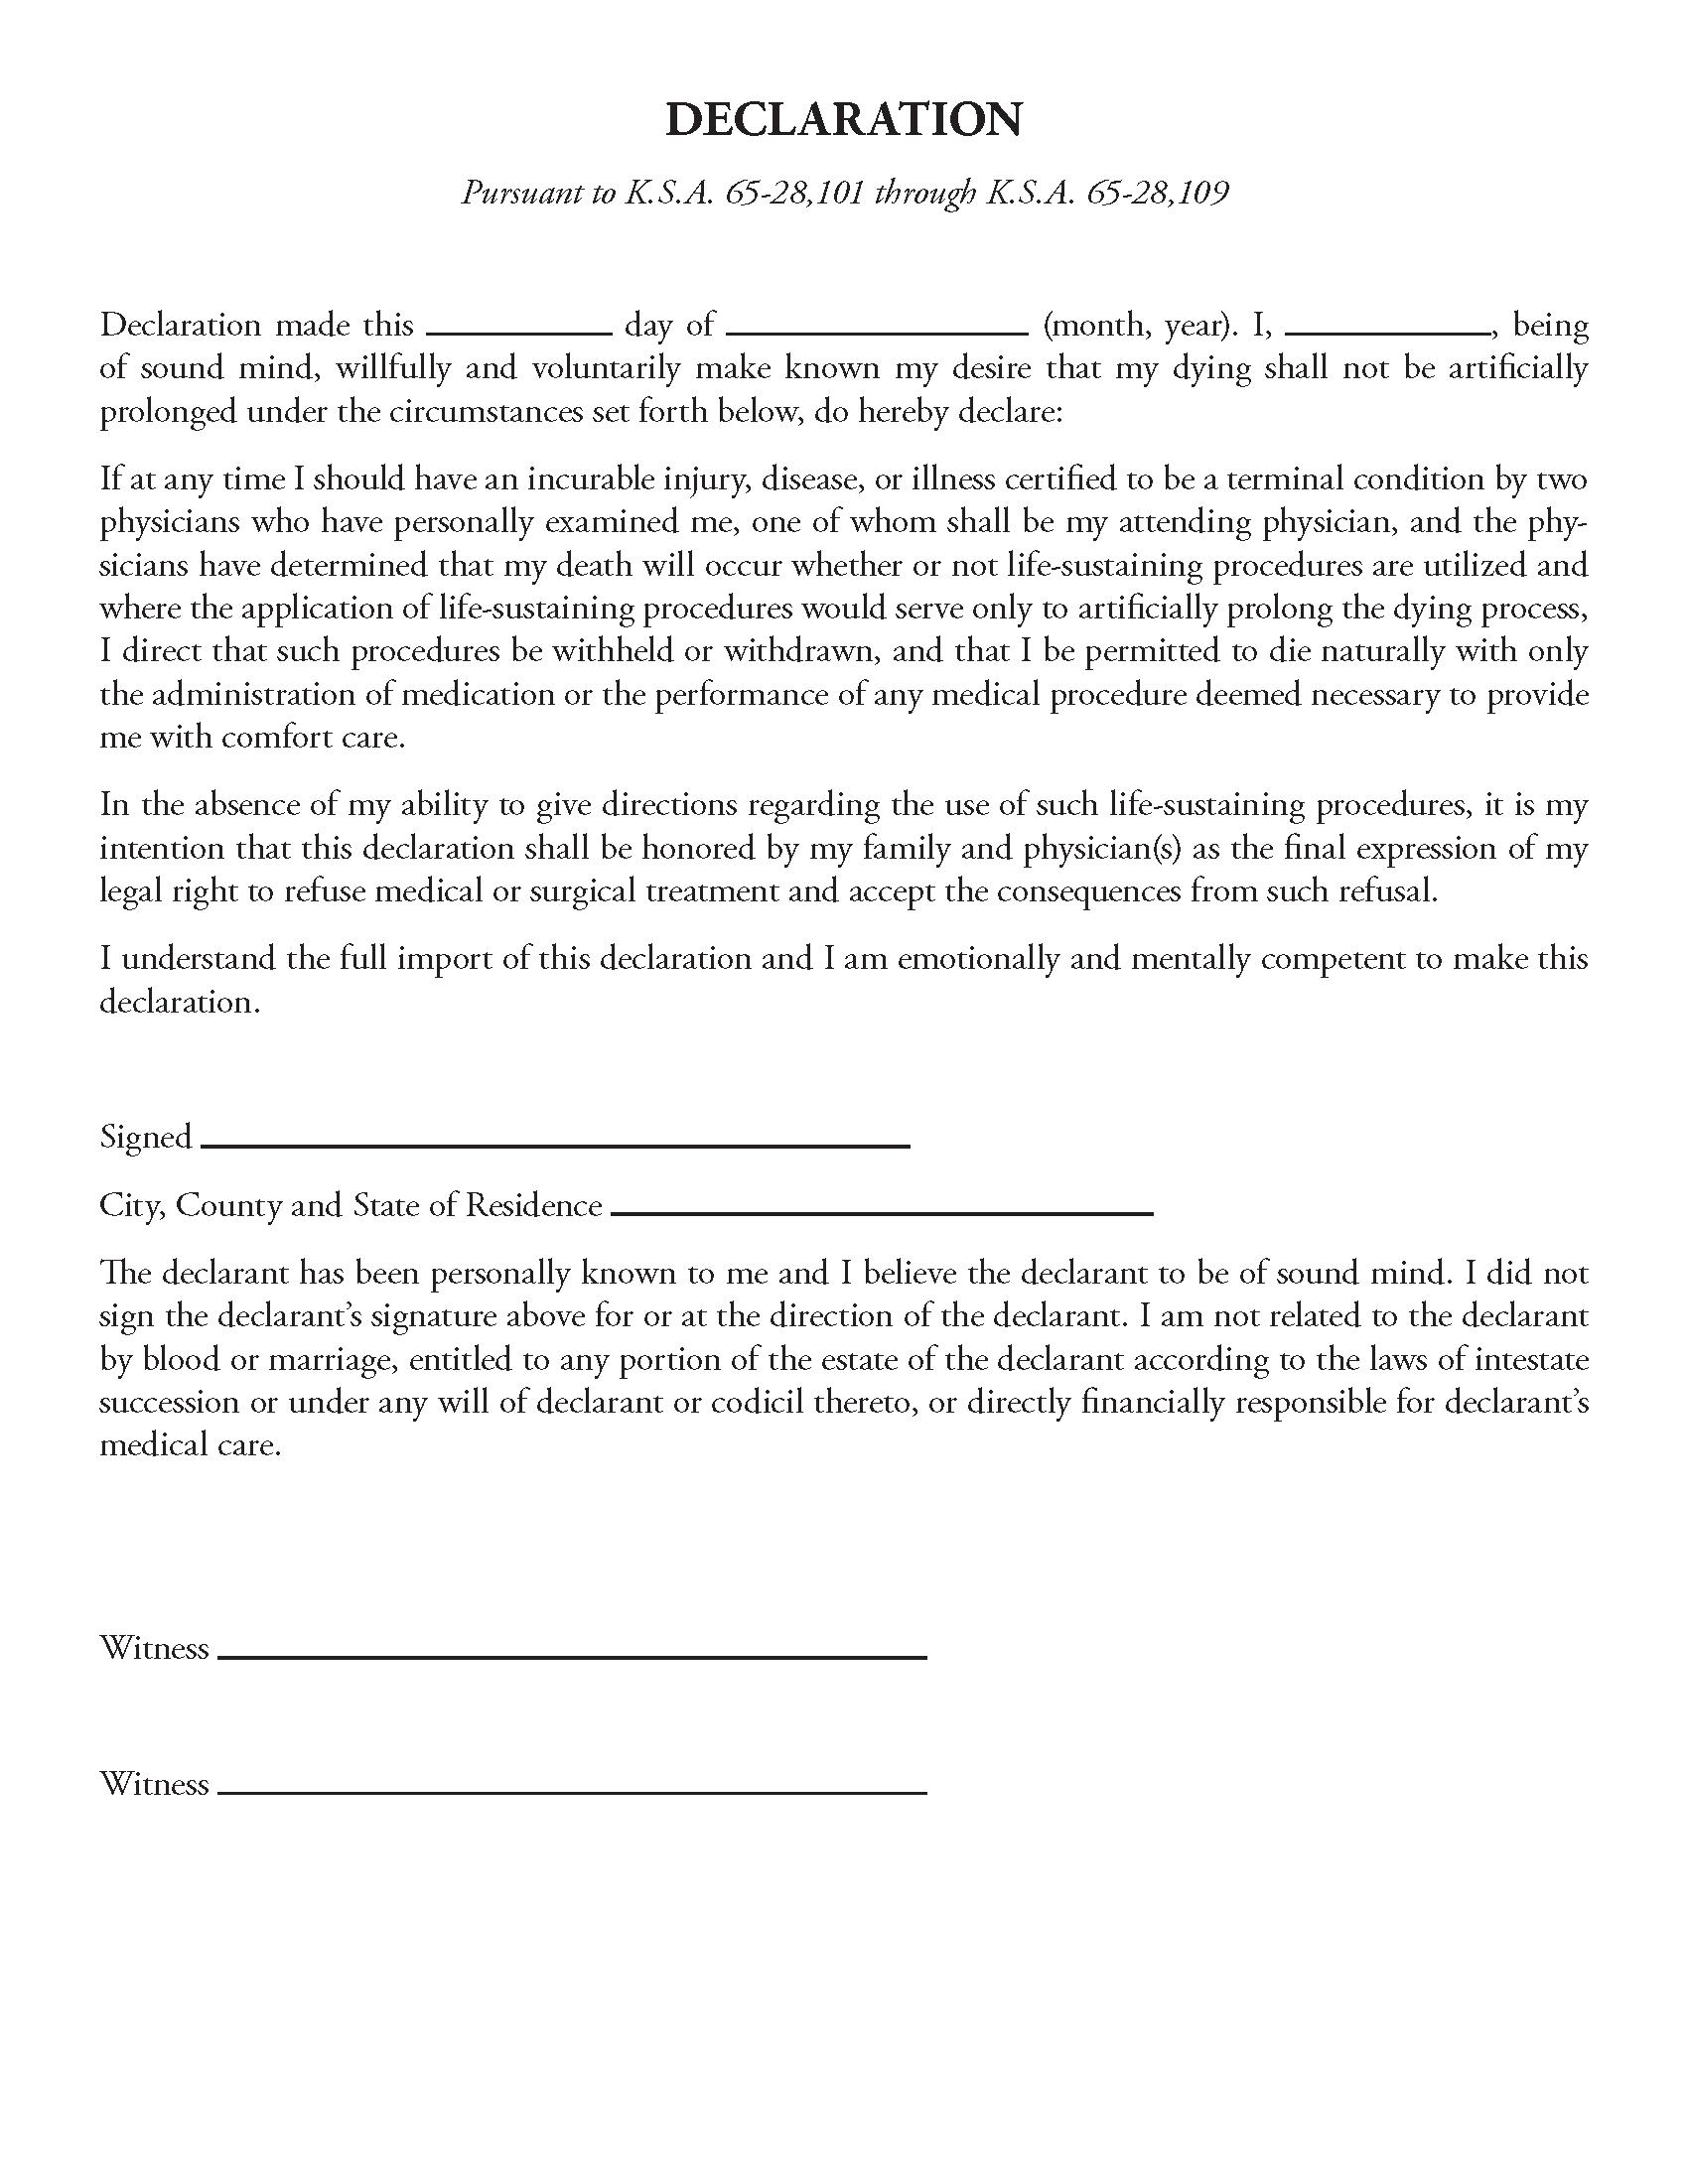 Kansas Living Will Form Fillable PDF Free Printable